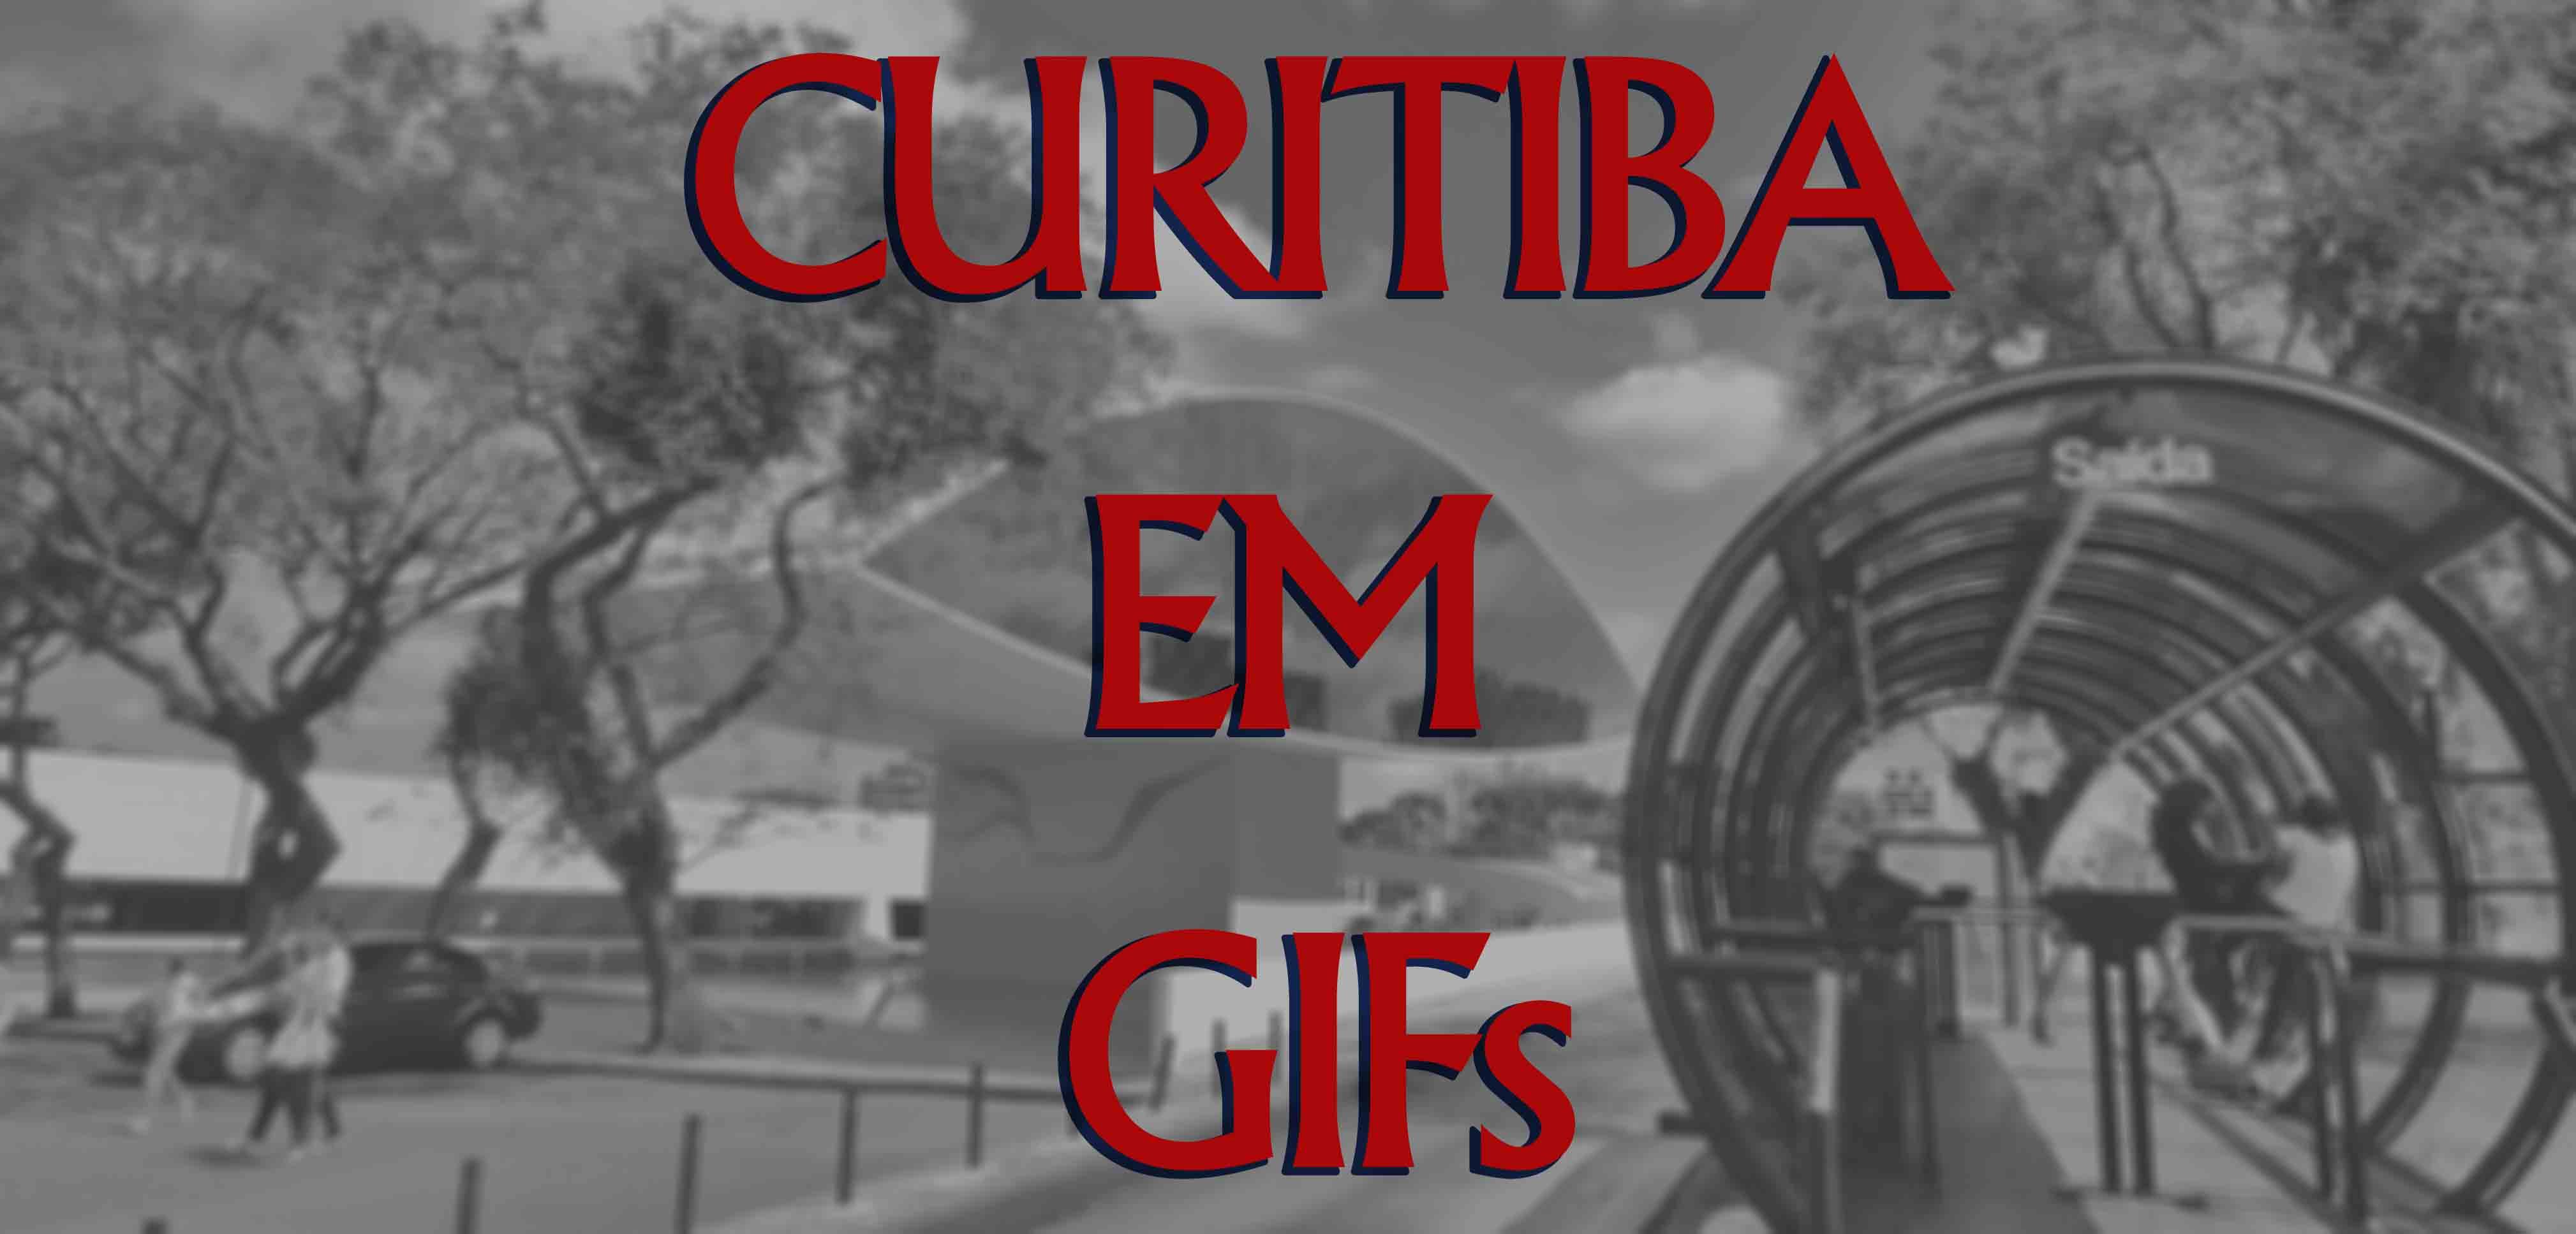 Curitiba através de GIFs